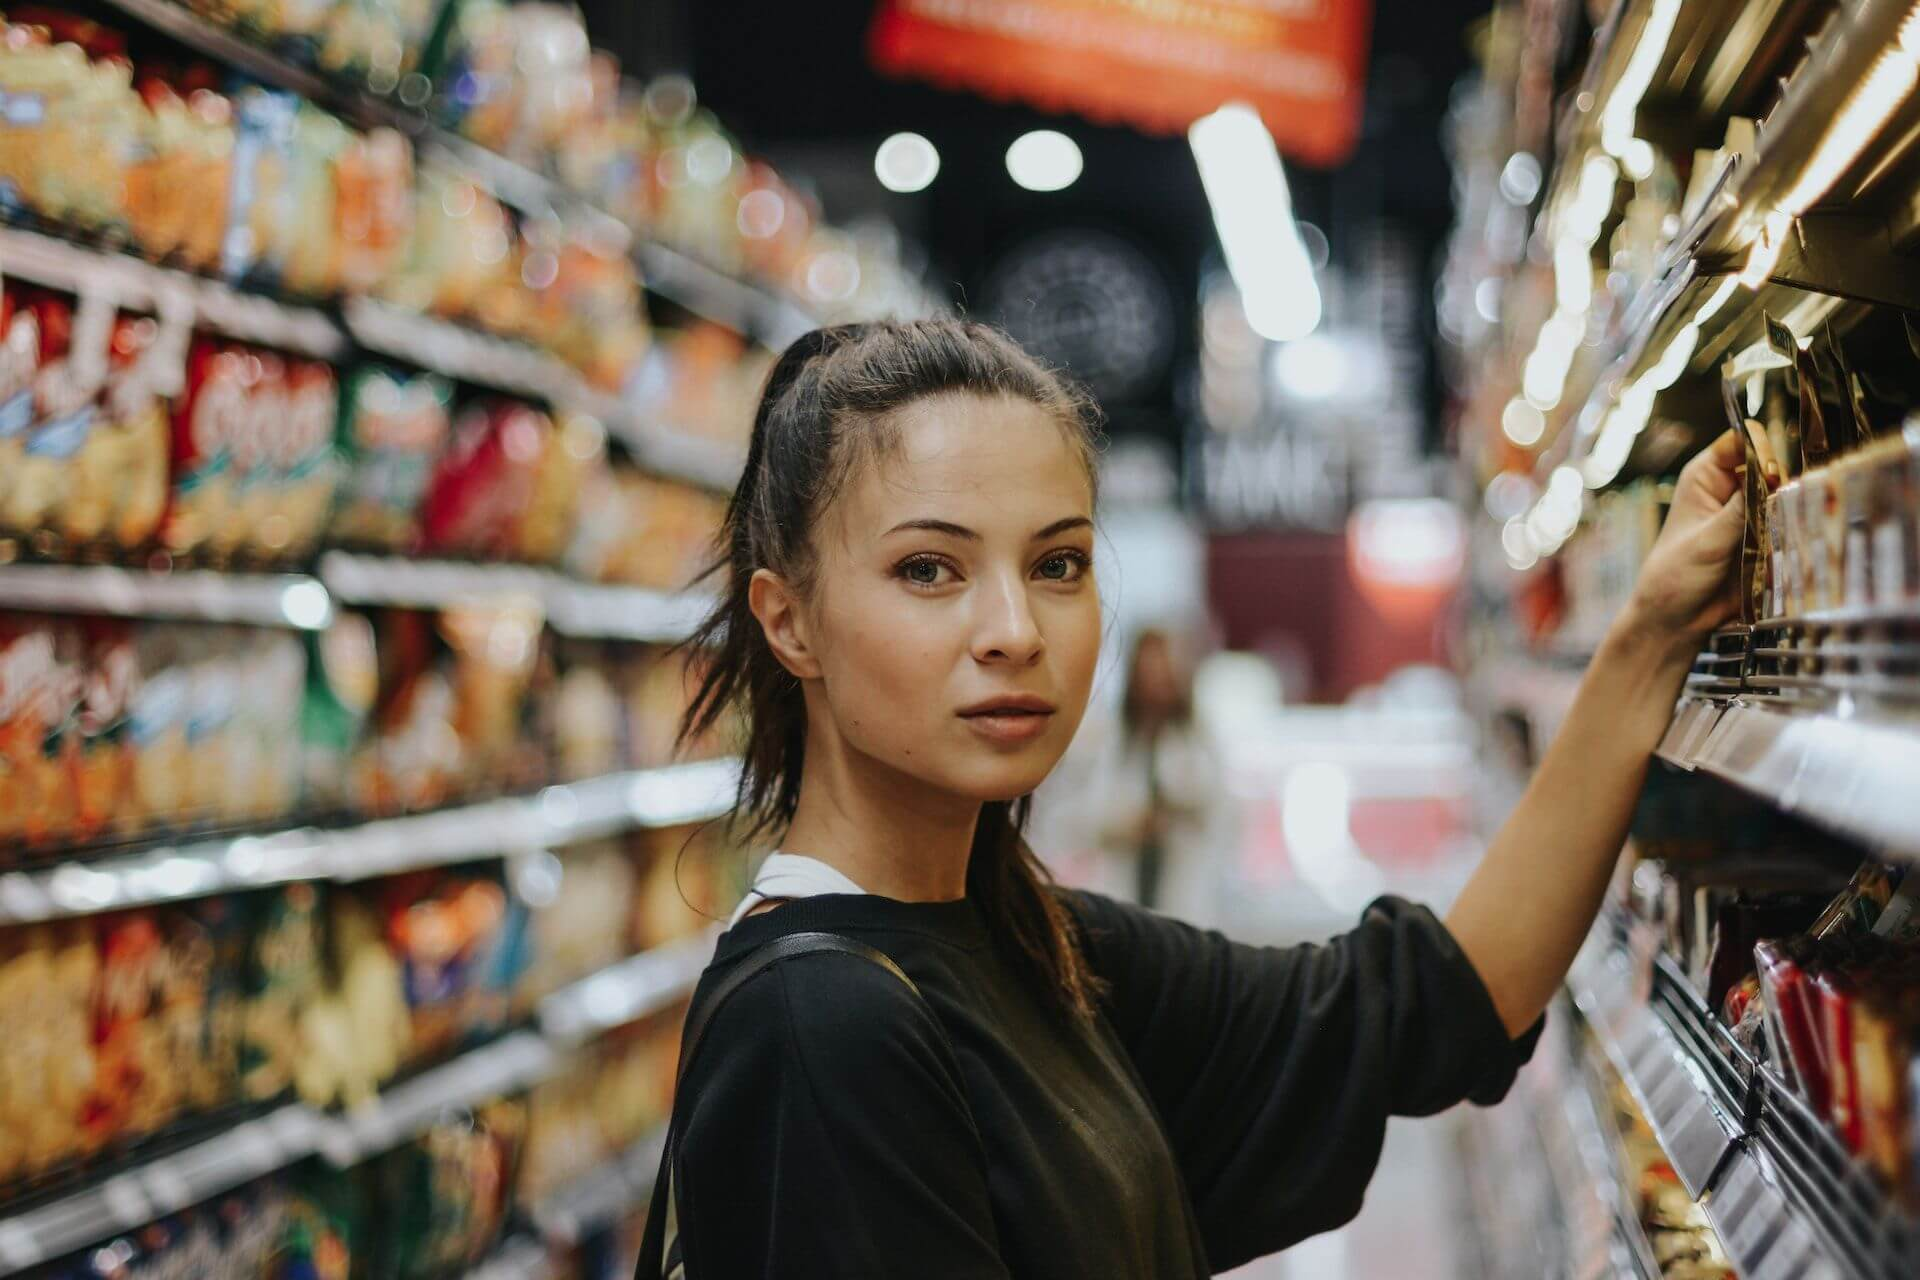 Verbrauchervertrag